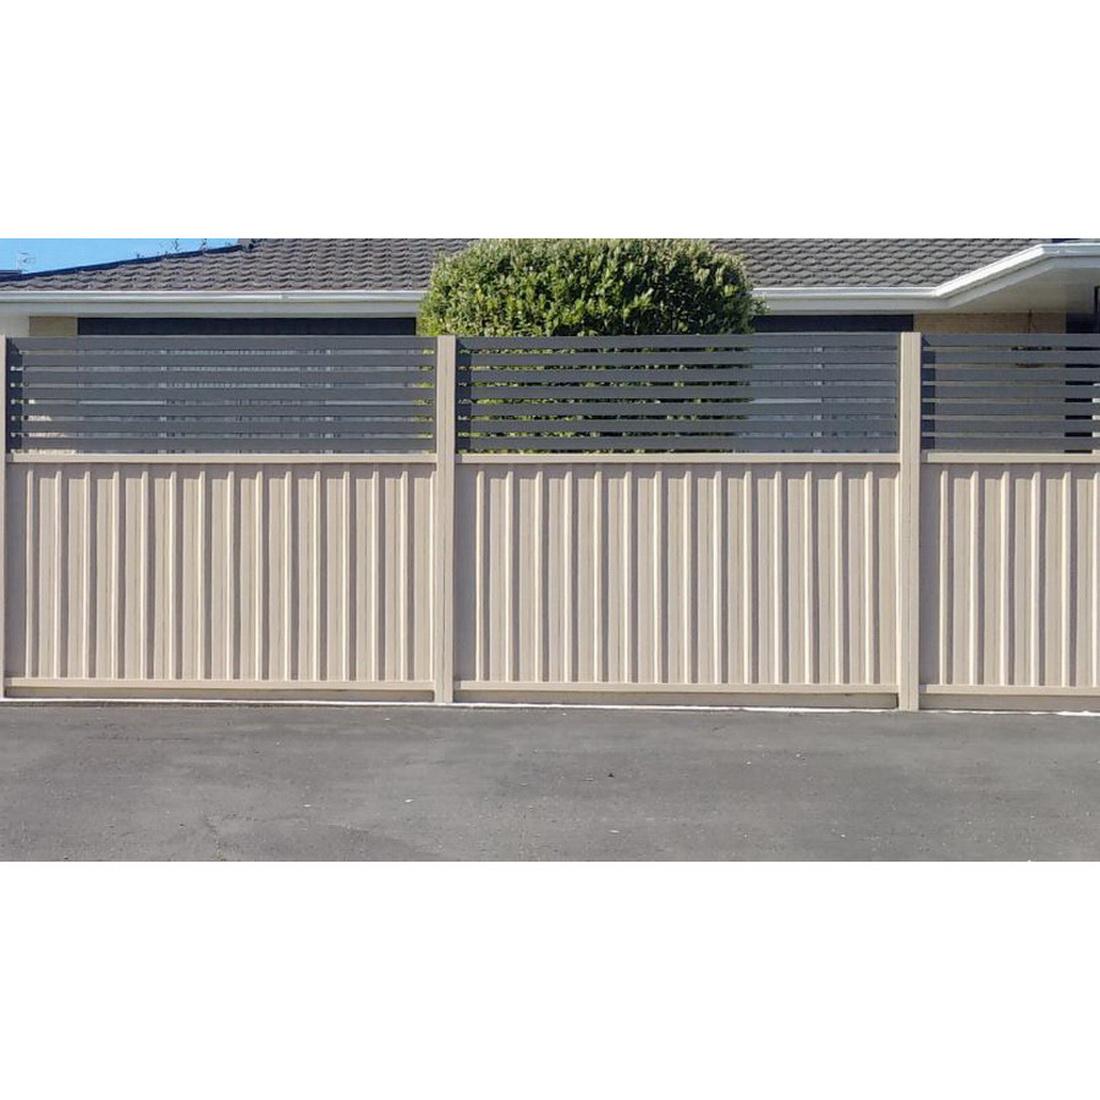 Borderline 1.2/3 Fencing Panel 1500 x 2300mm 300mm Aluminum Slat Infill Ironsand SBO1.2/0.3-I